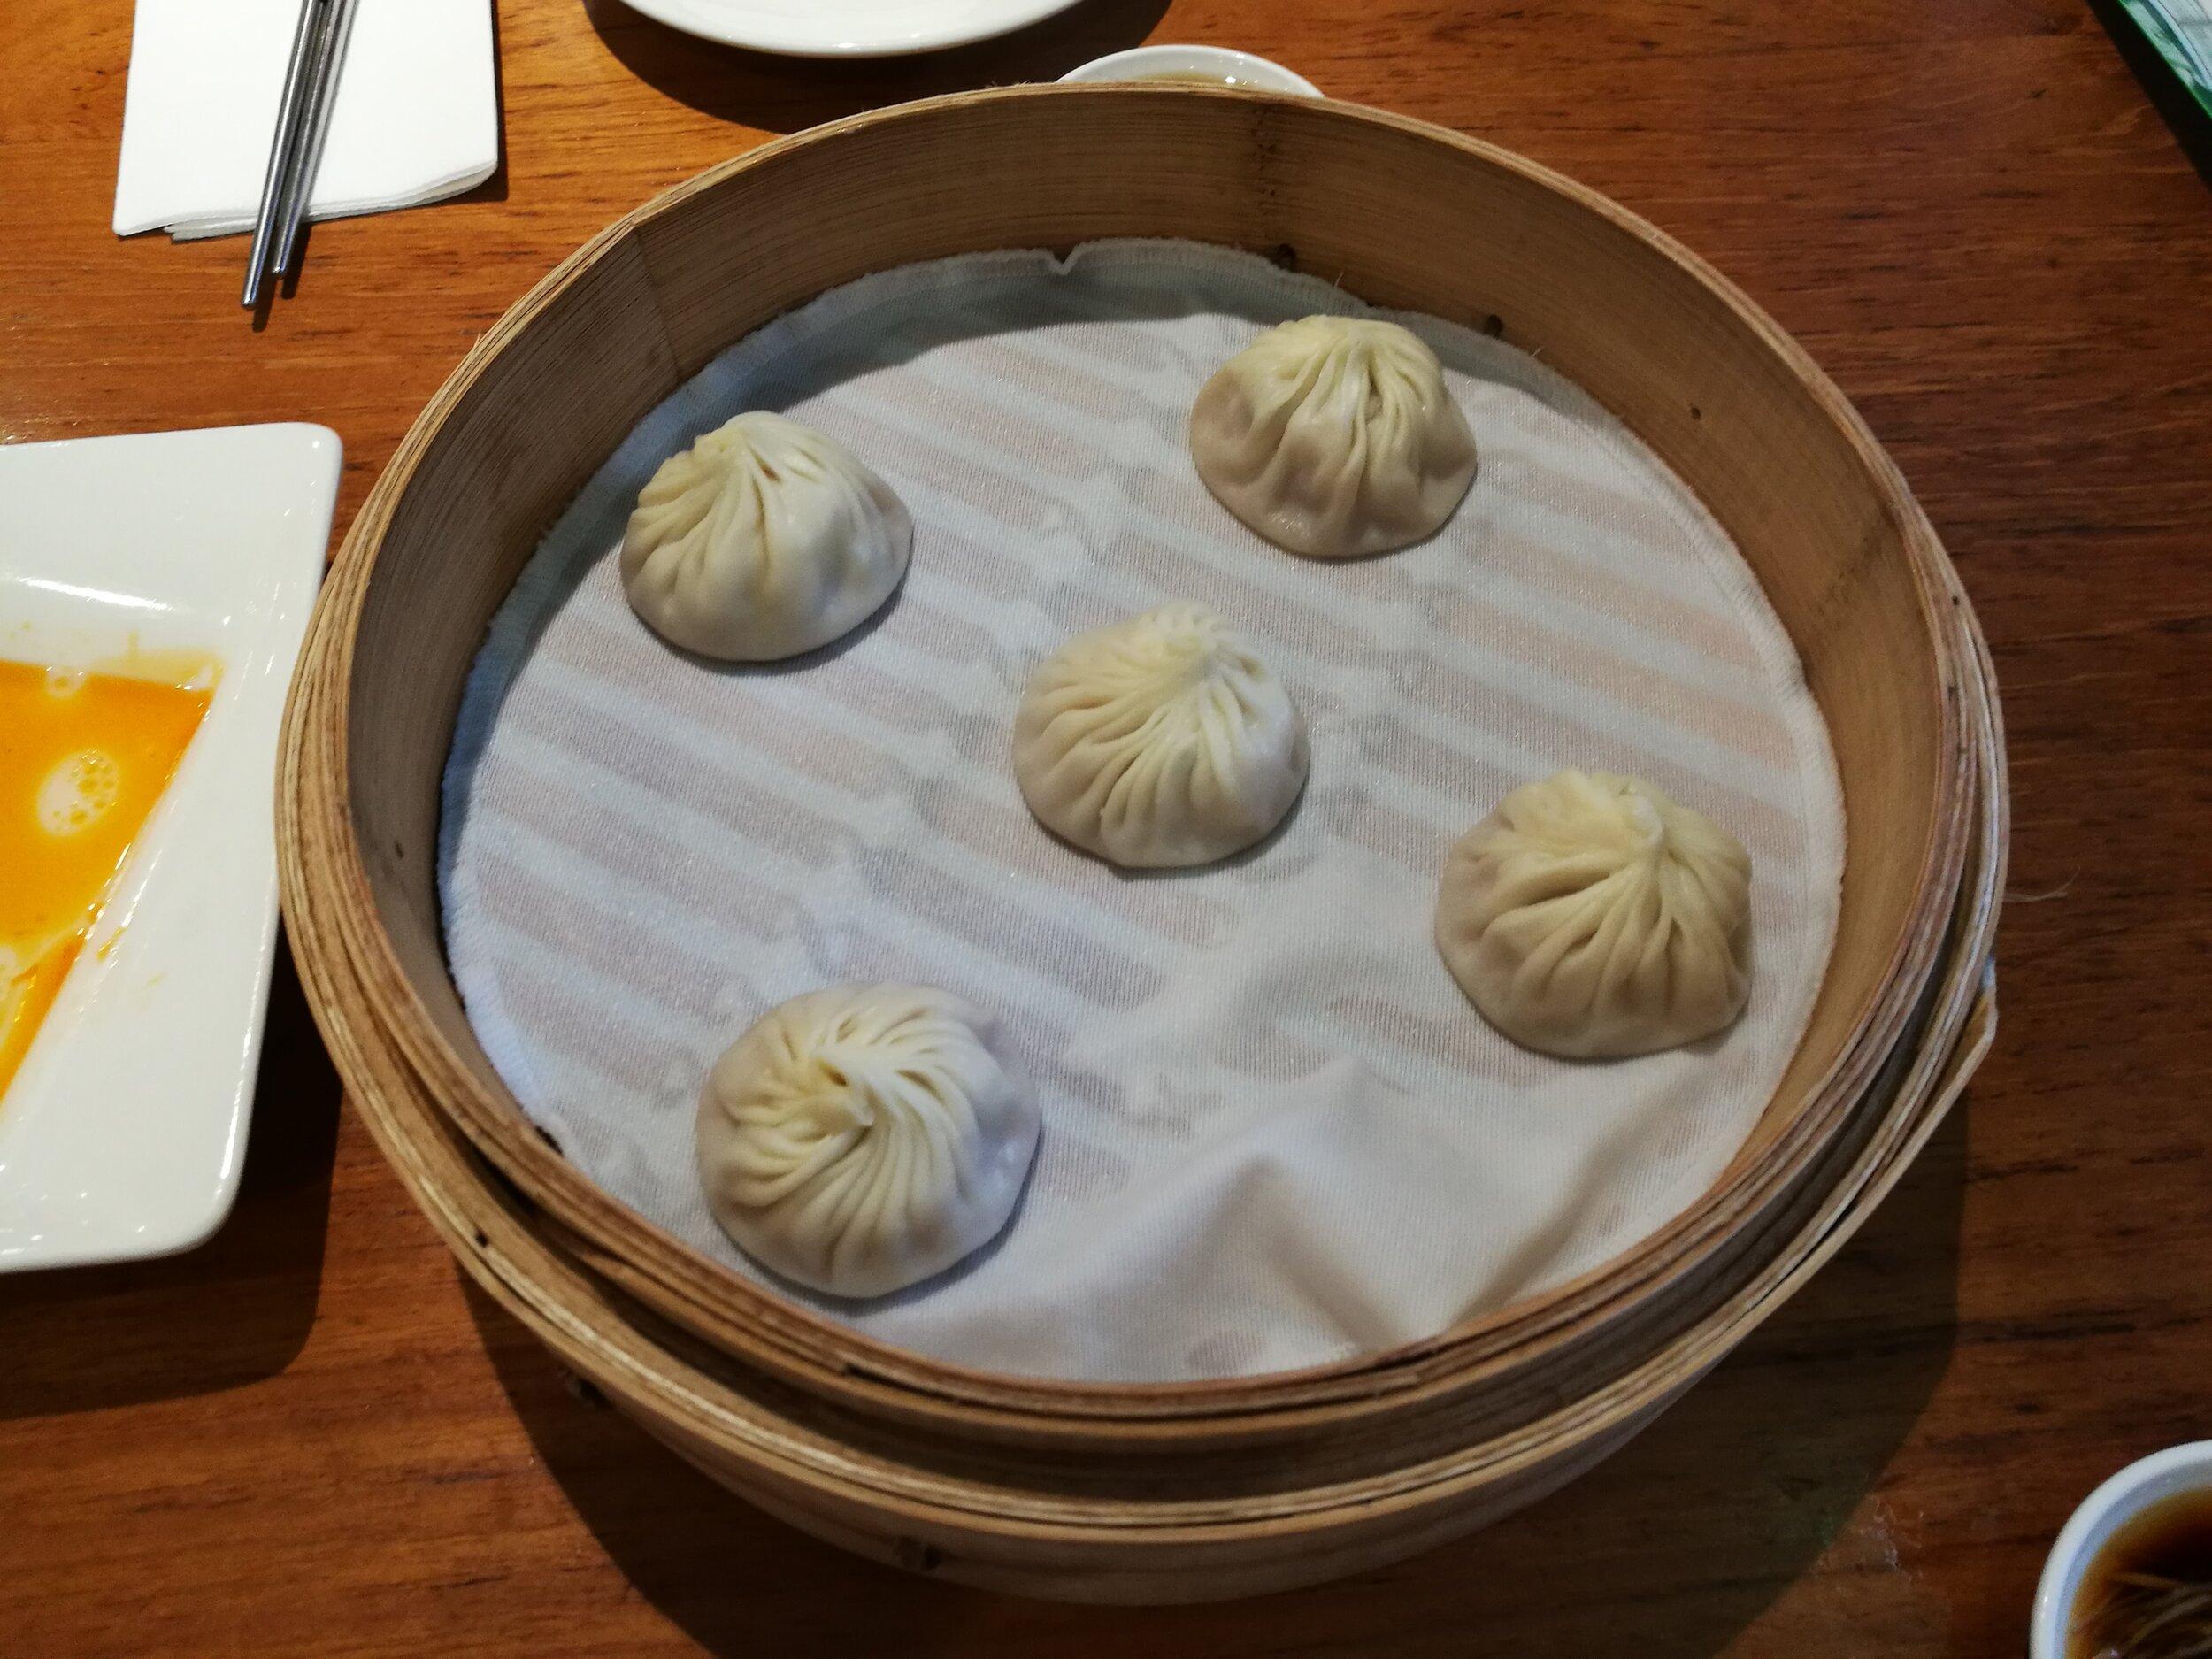 Delicious dumplings